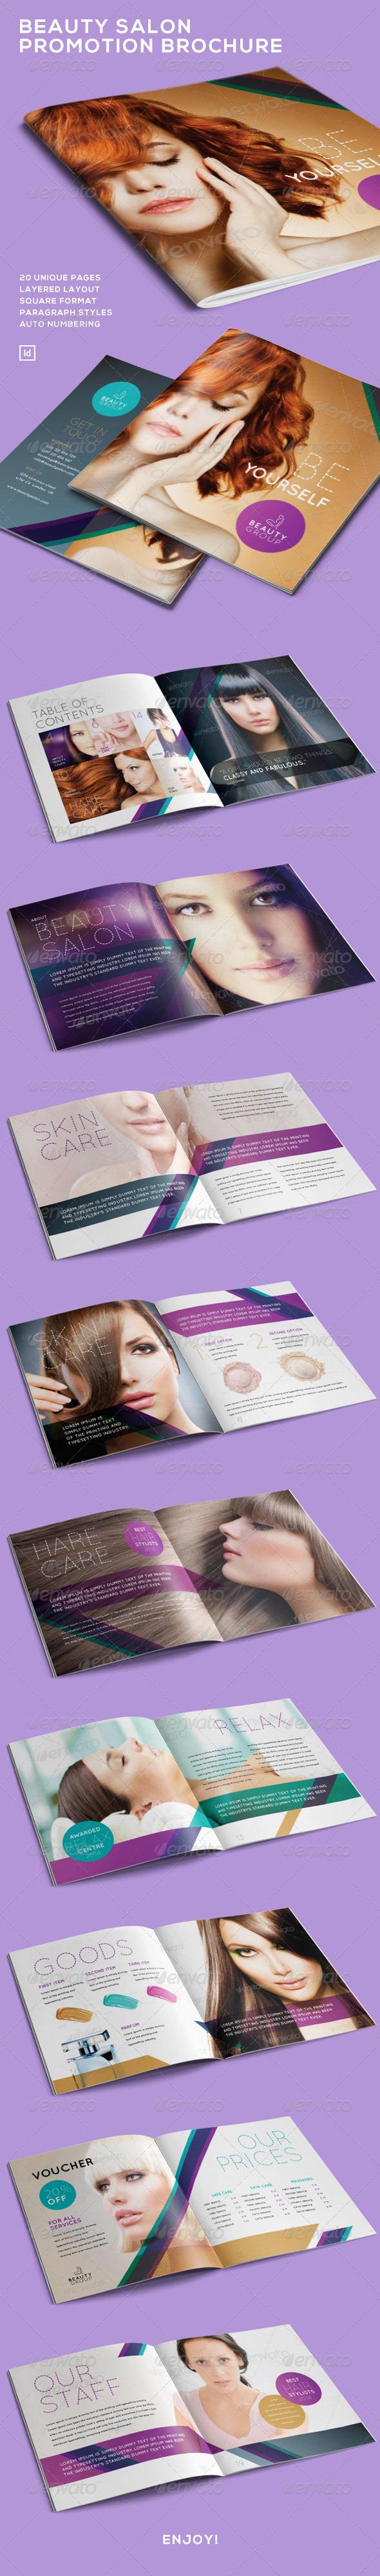 GraphicRiver Beauty Salon Promotion Brochure 7448350